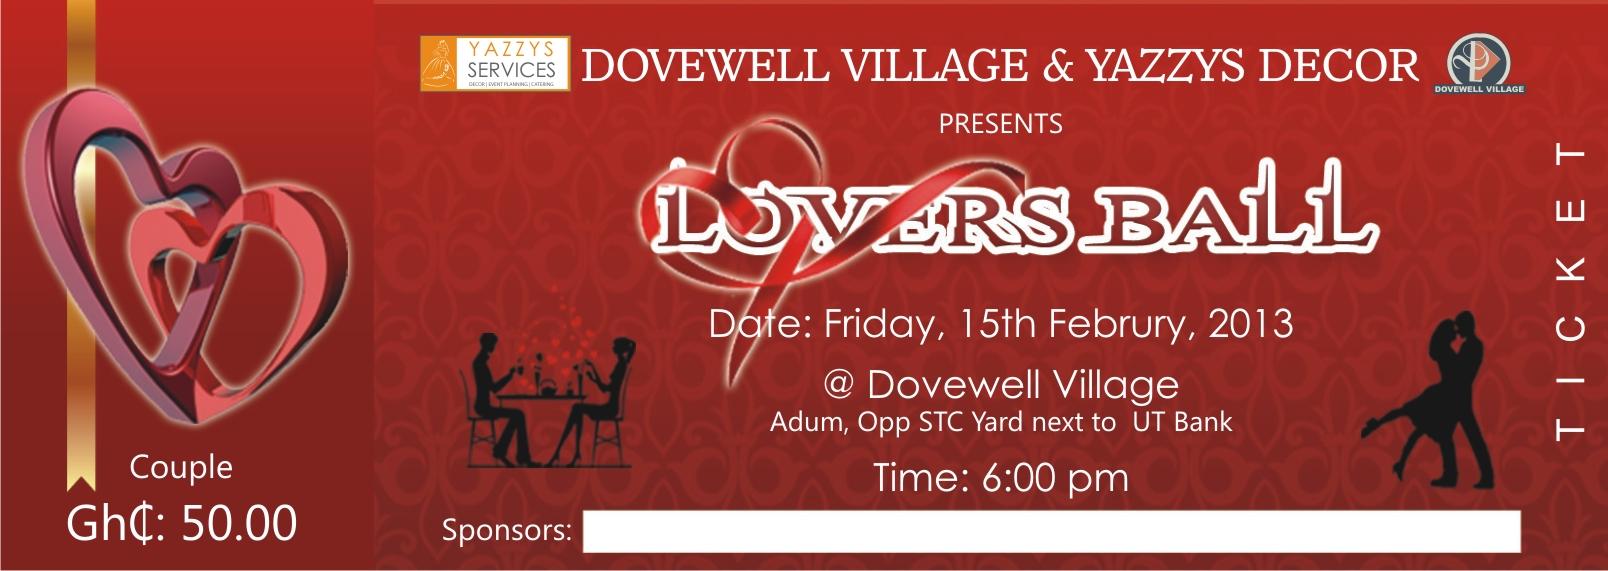 dovewell dinner ticket by fordcom on deviantart